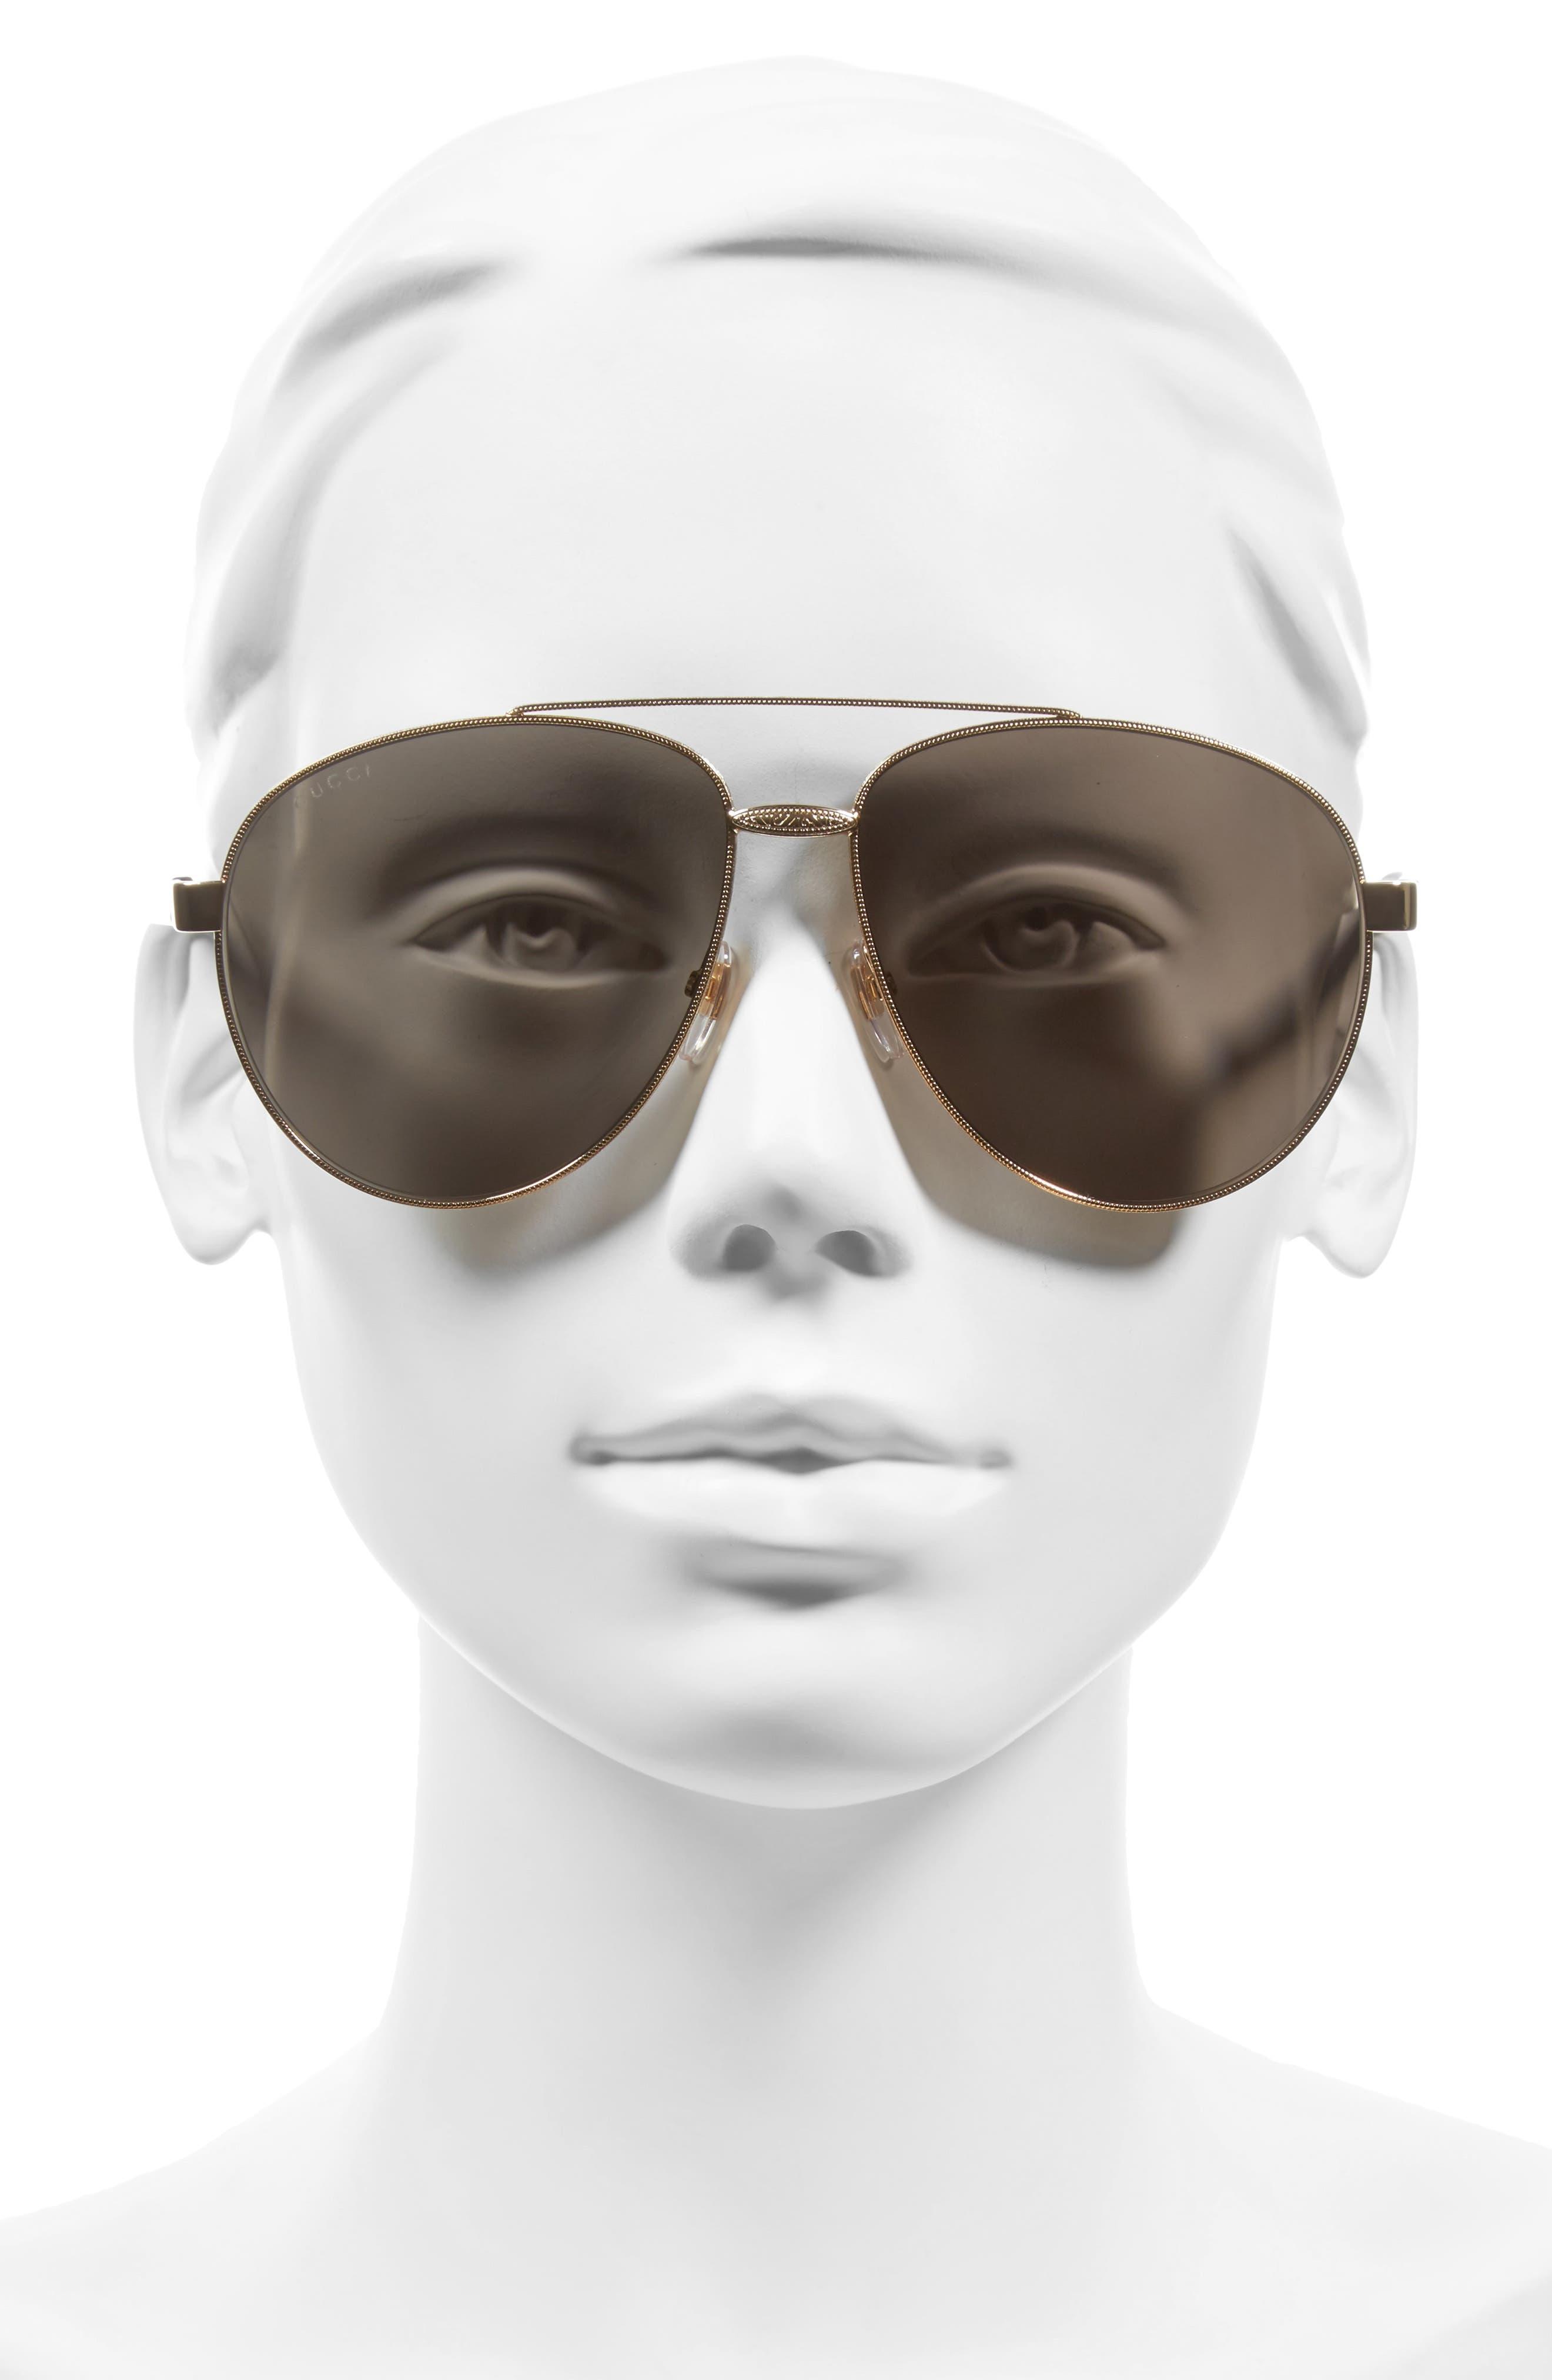 61mm Aviator Sunglasses,                             Alternate thumbnail 3, color,                             710